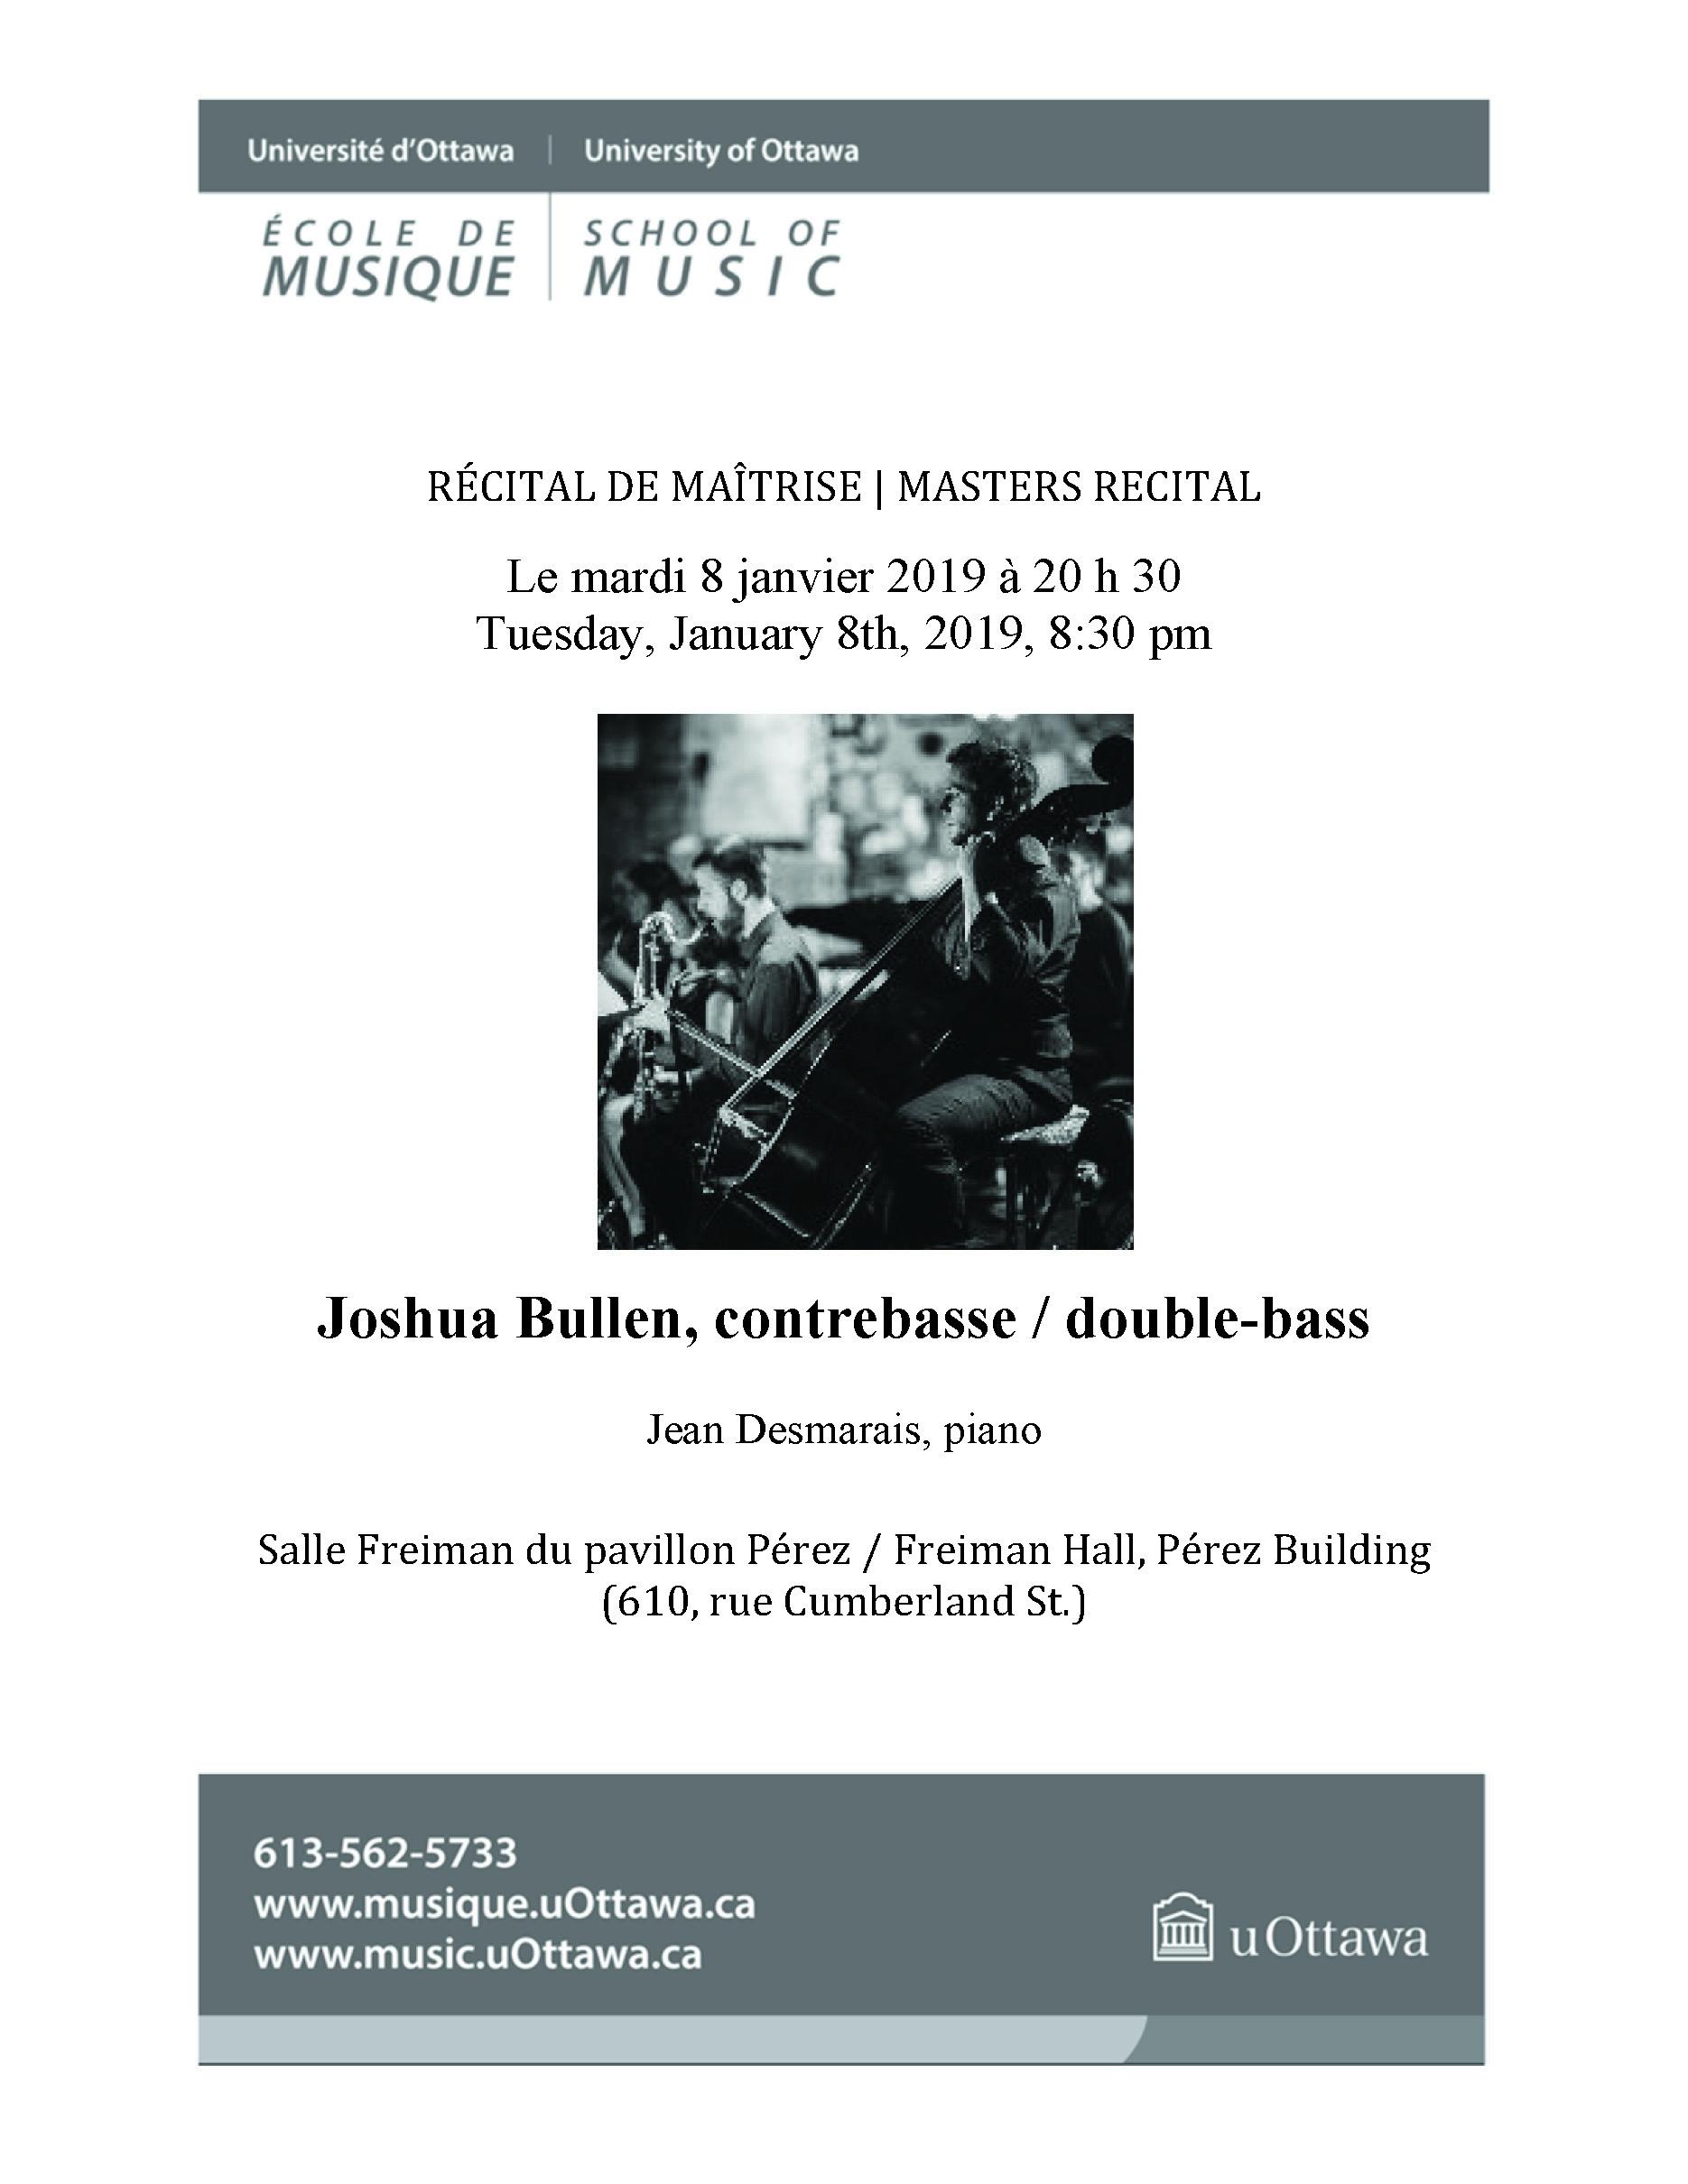 Joshua Bullen program page 1